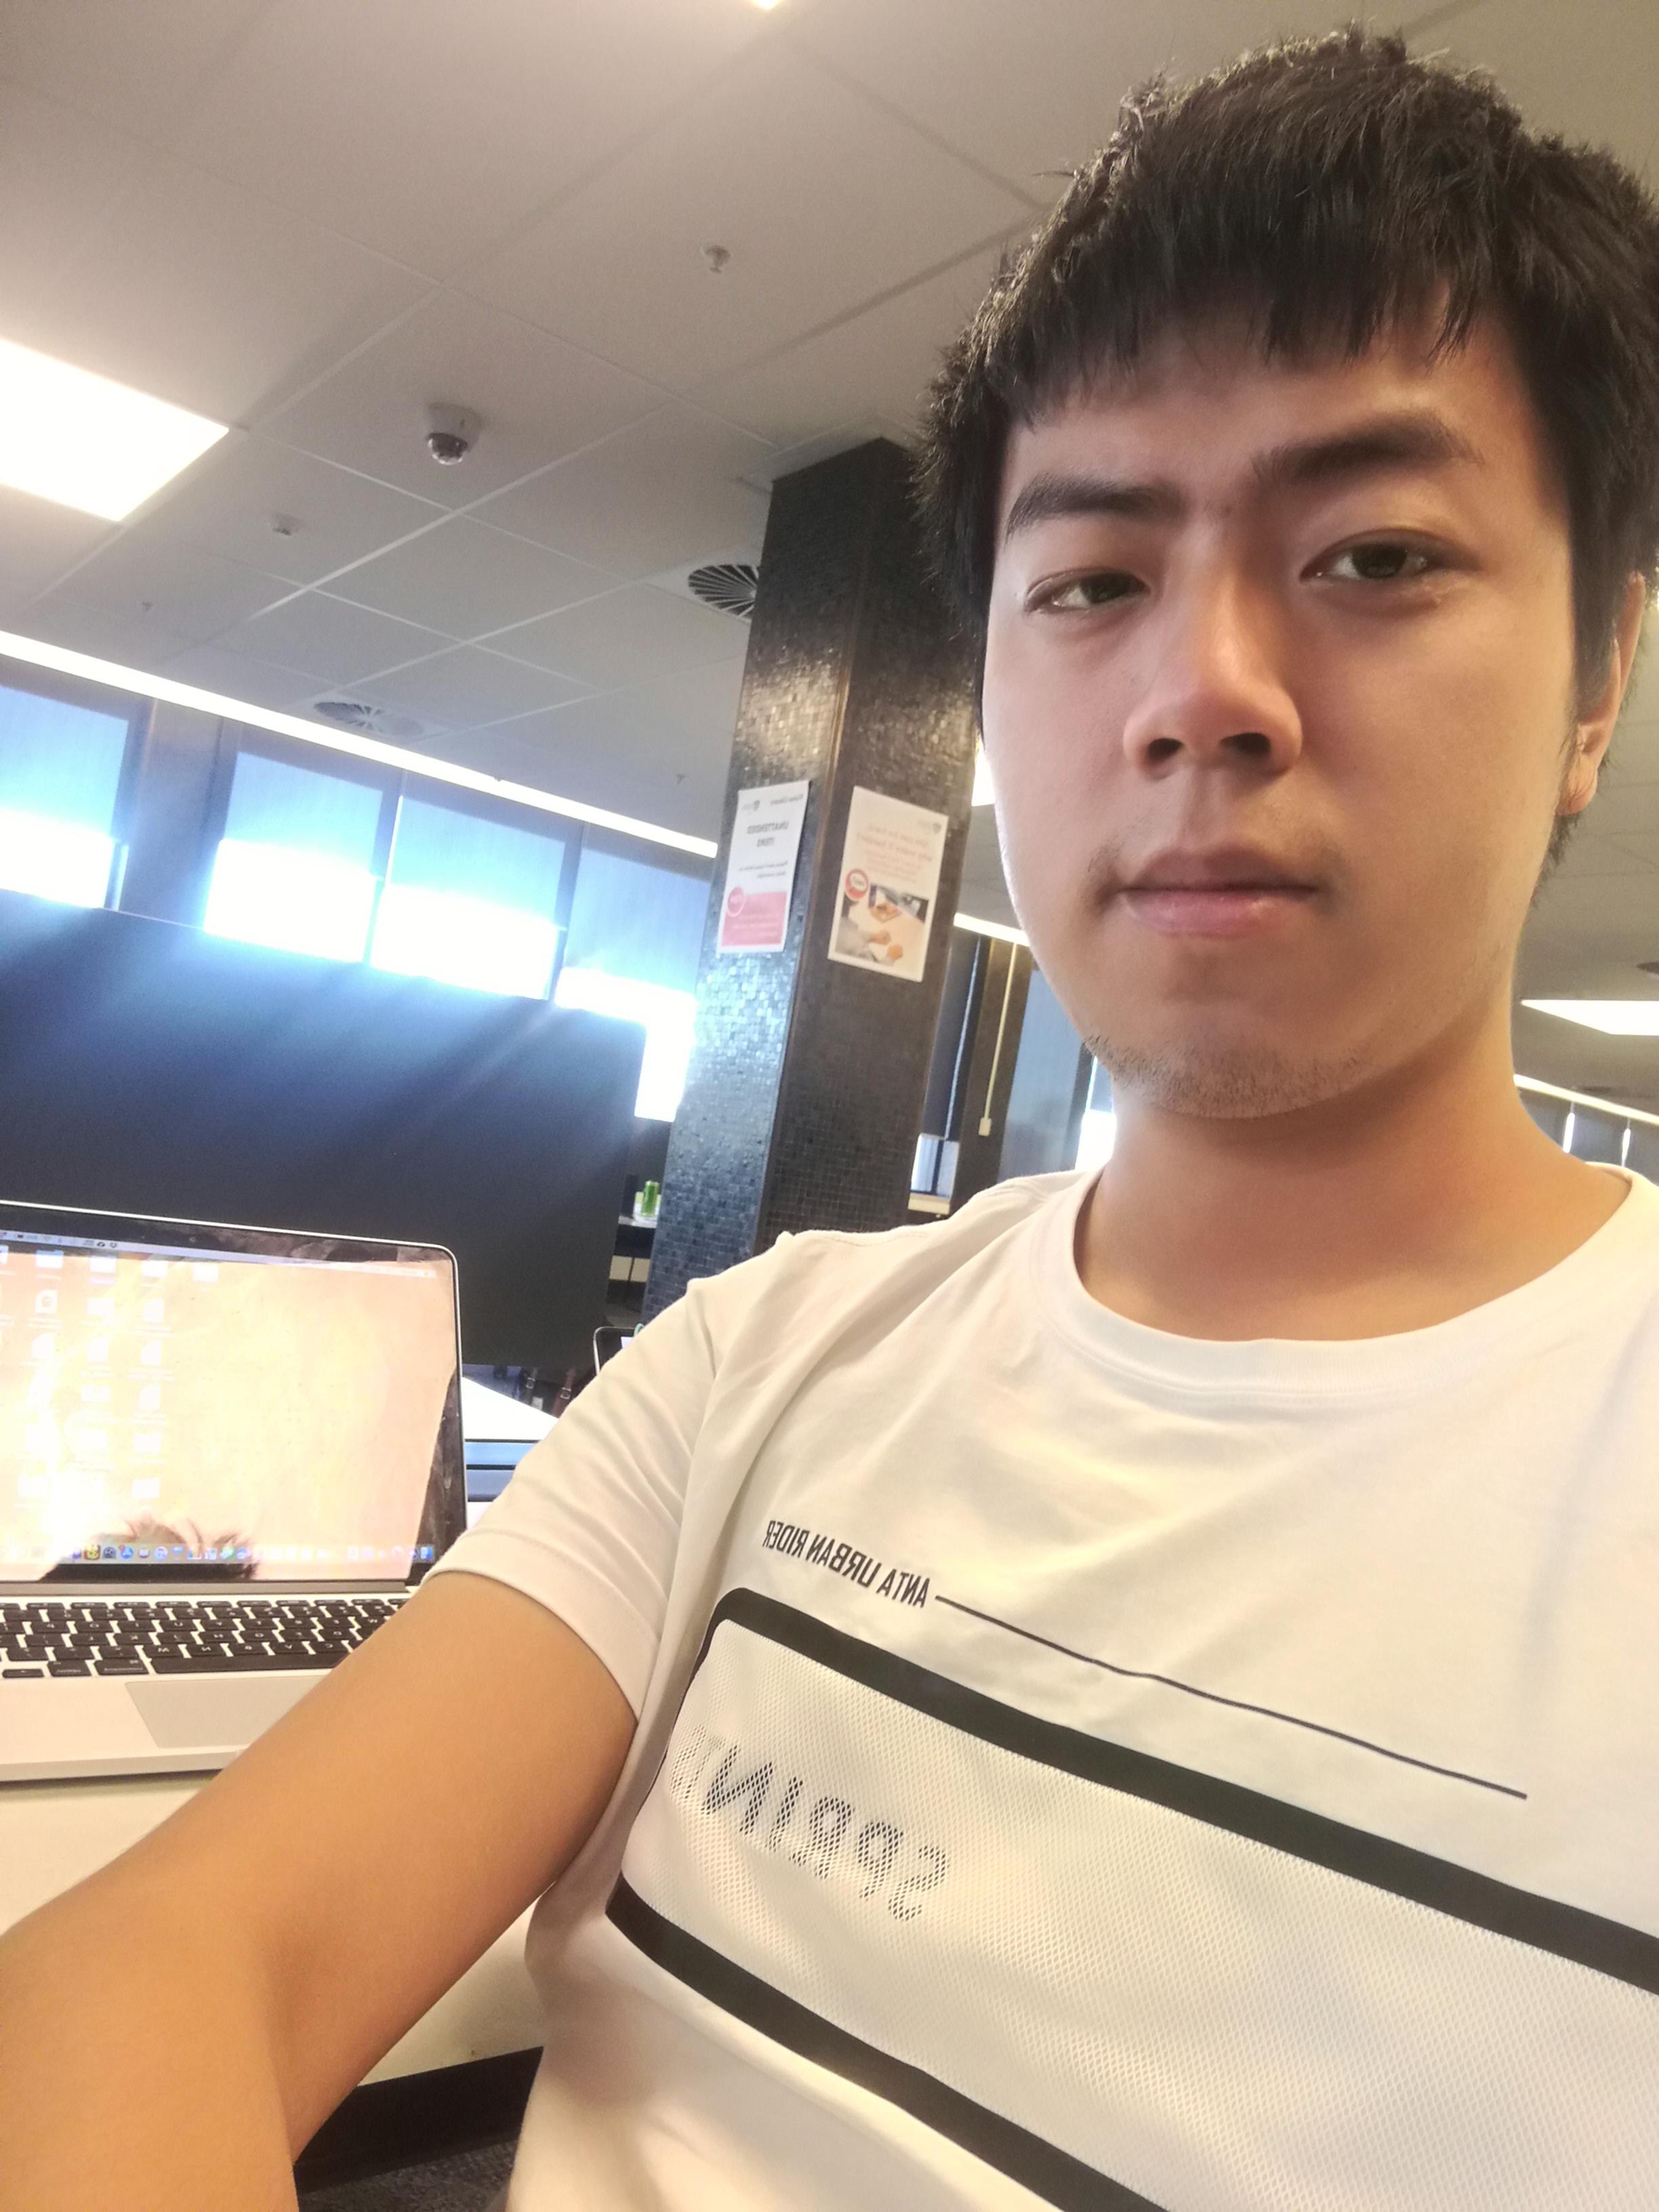 Rui Cao is a master student in the university of Sydney supervised by professor Jaime Gongora. He is working on the population genetics in Australian freshwater crocodile Crocodylus johsntoni.